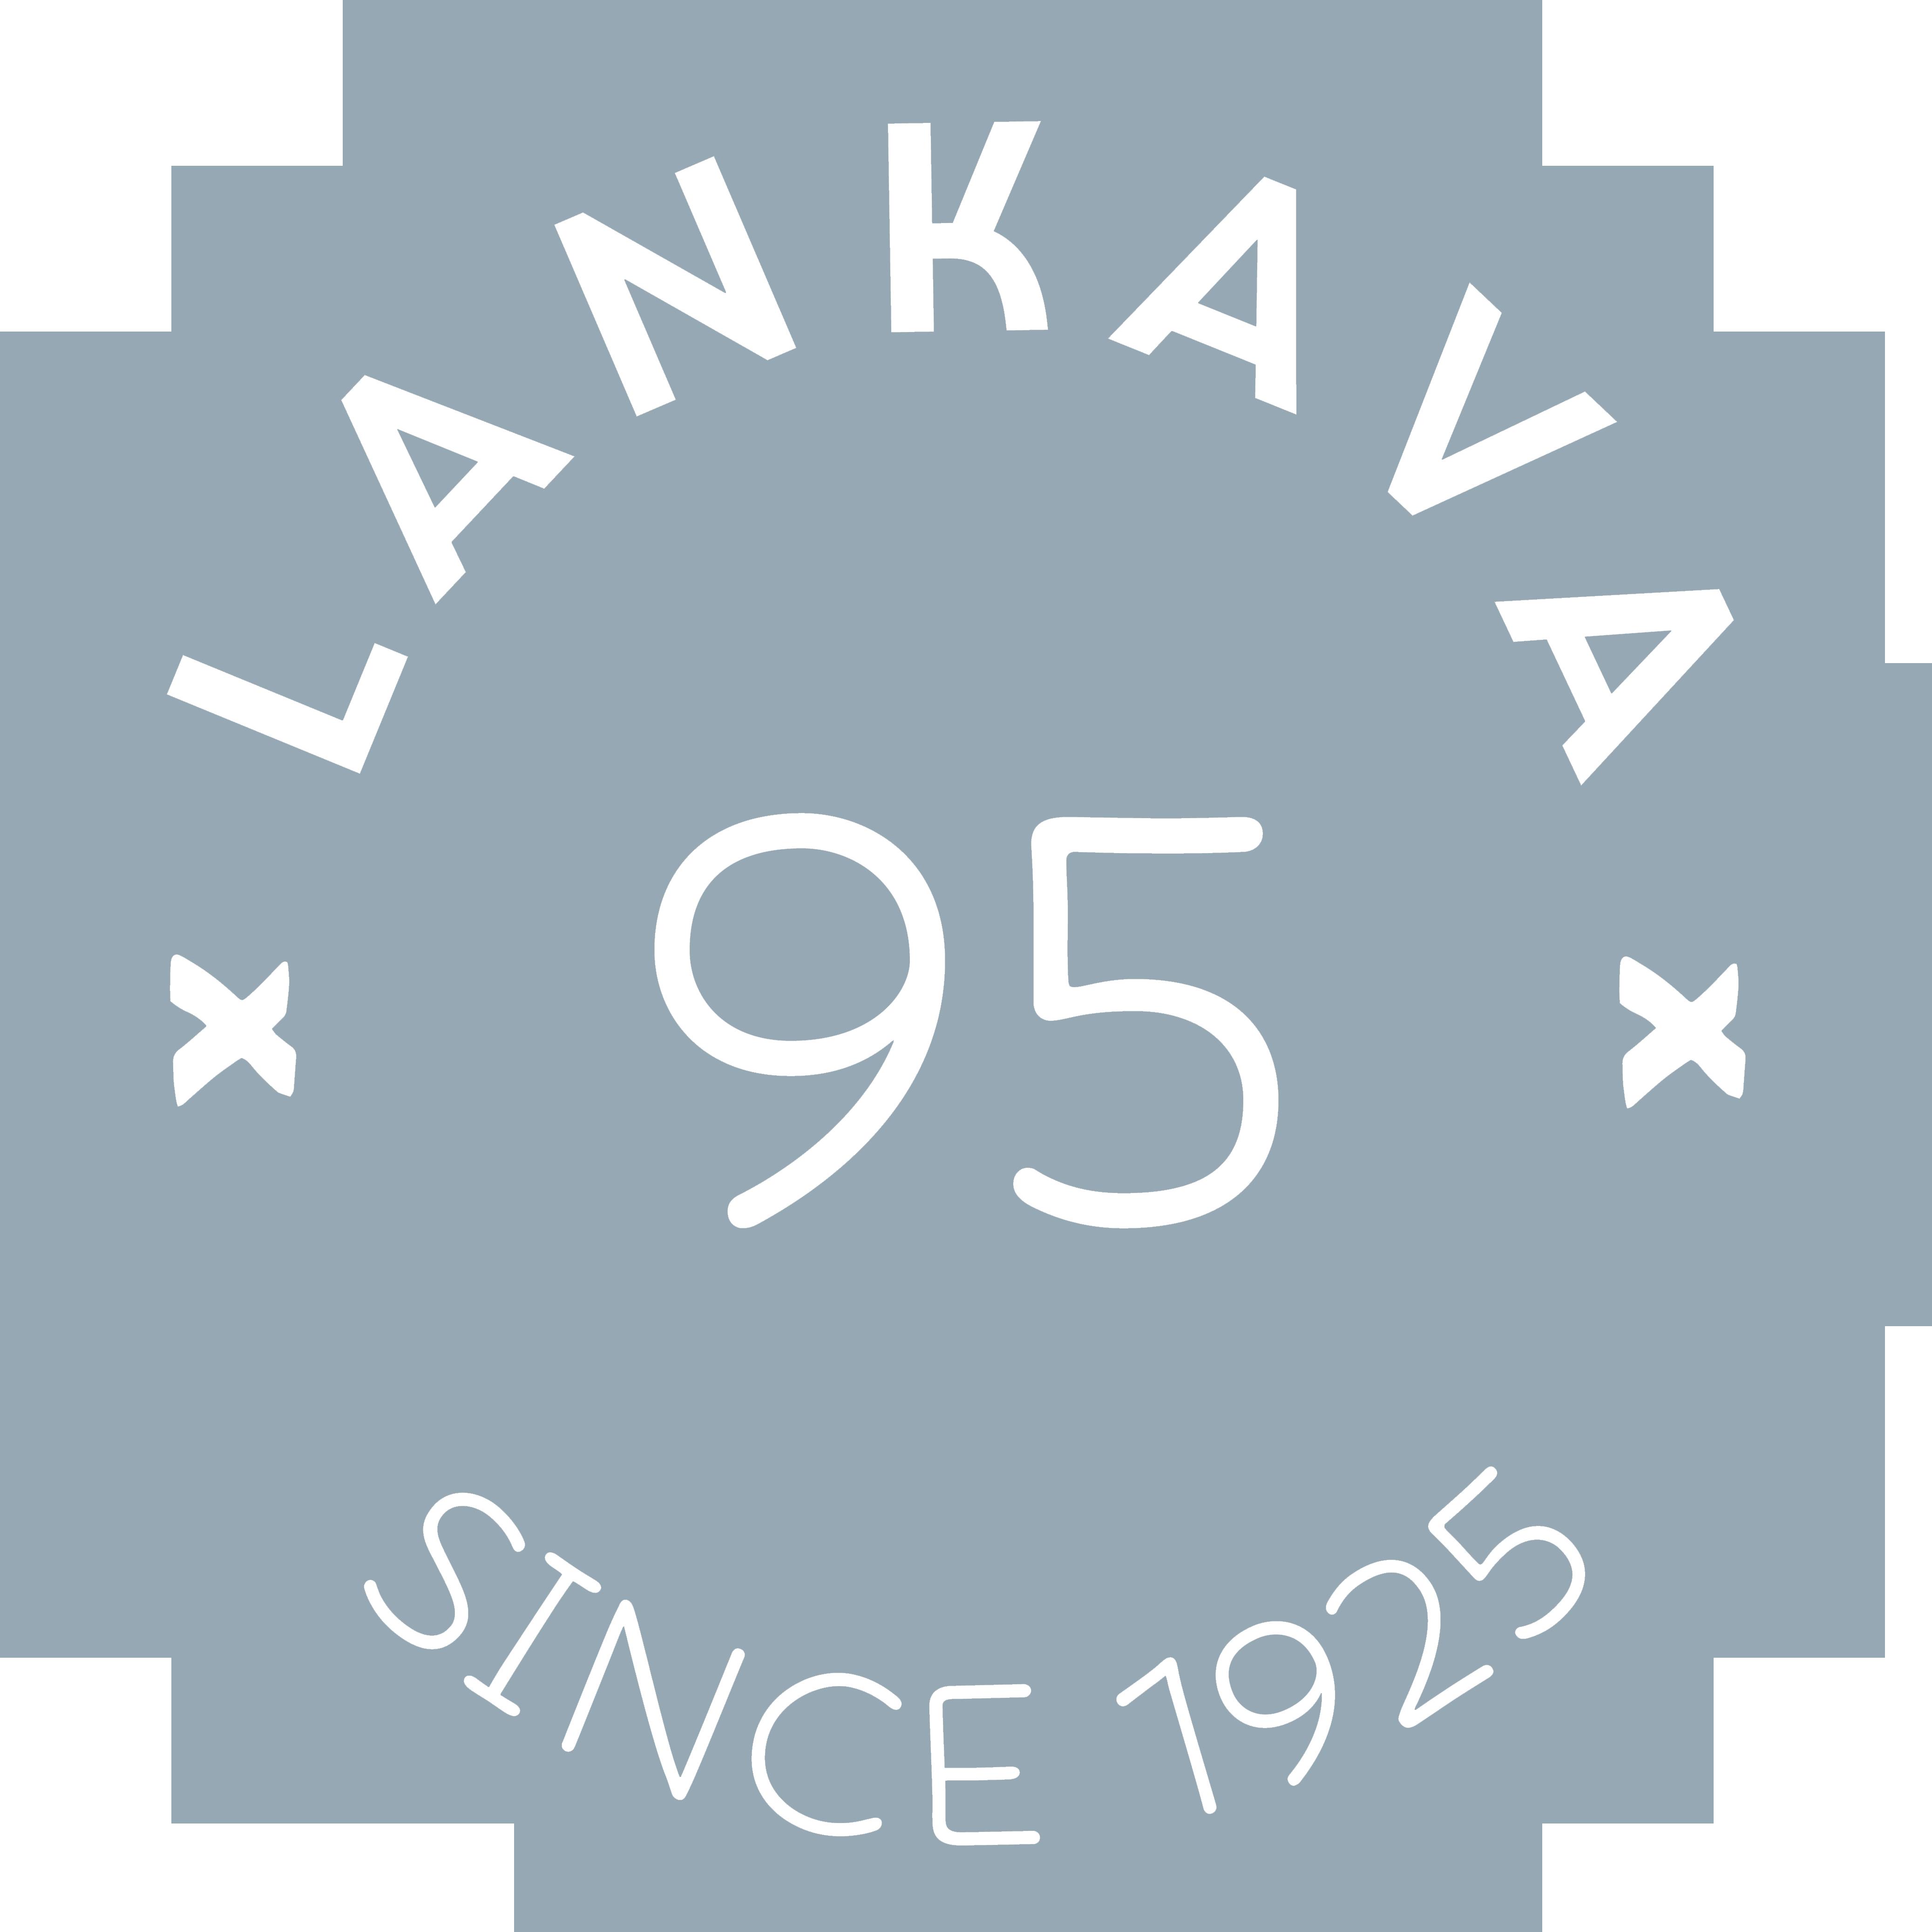 Lankava 95-v